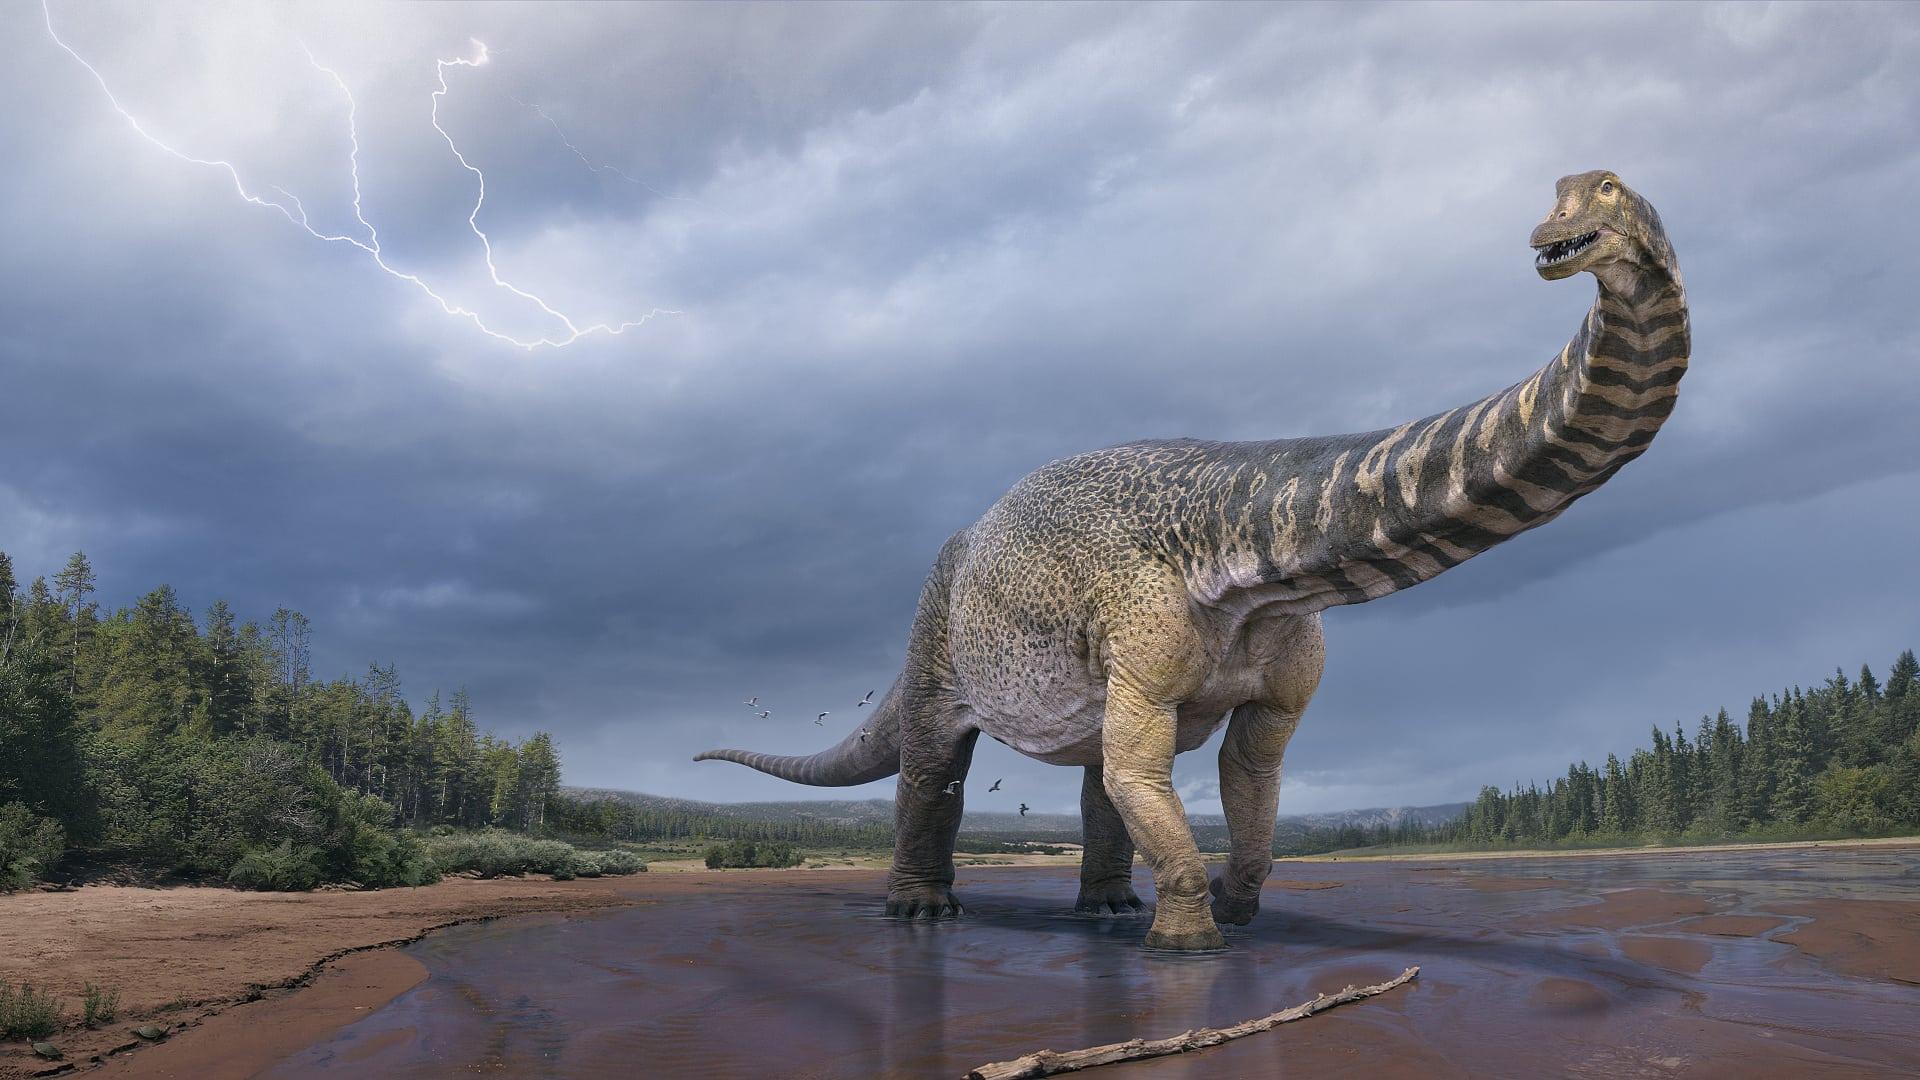 Australotitan coprensis: a new titanium dinosaur from Gondwana